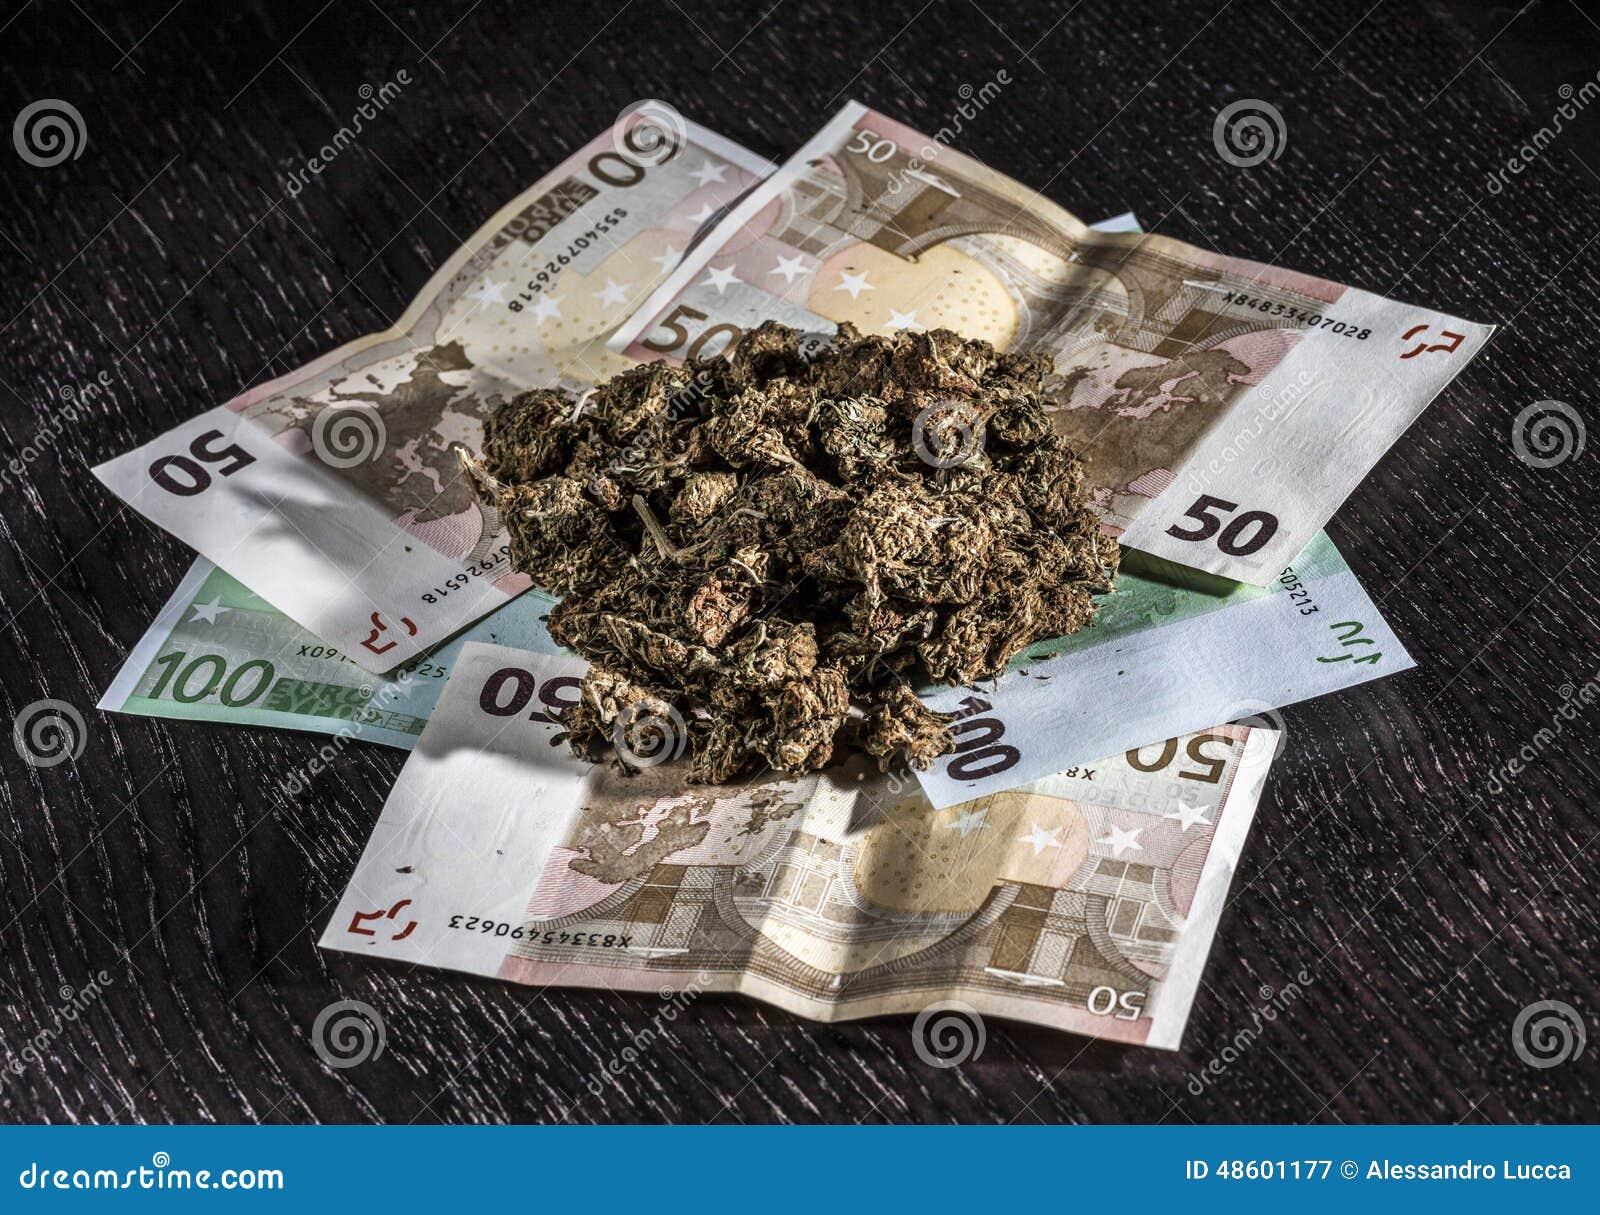 Marijuana: Effects, Medical Uses and Legalization